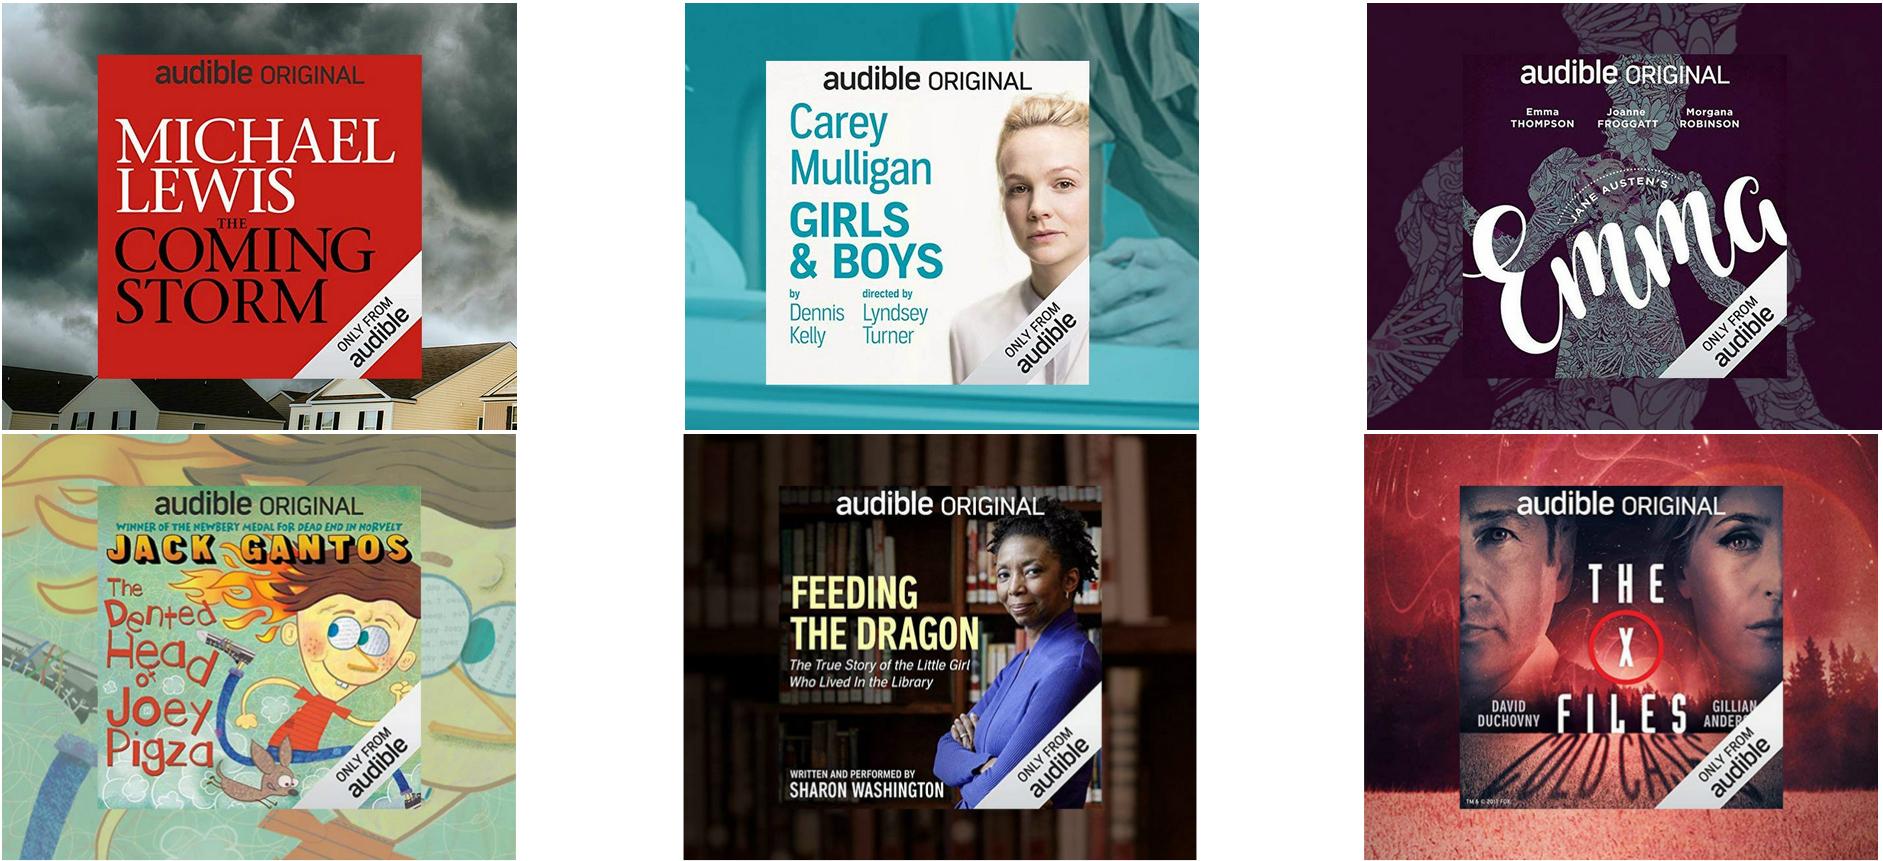 new Audible members get a free audiobooks deal – Audible Originals books for members